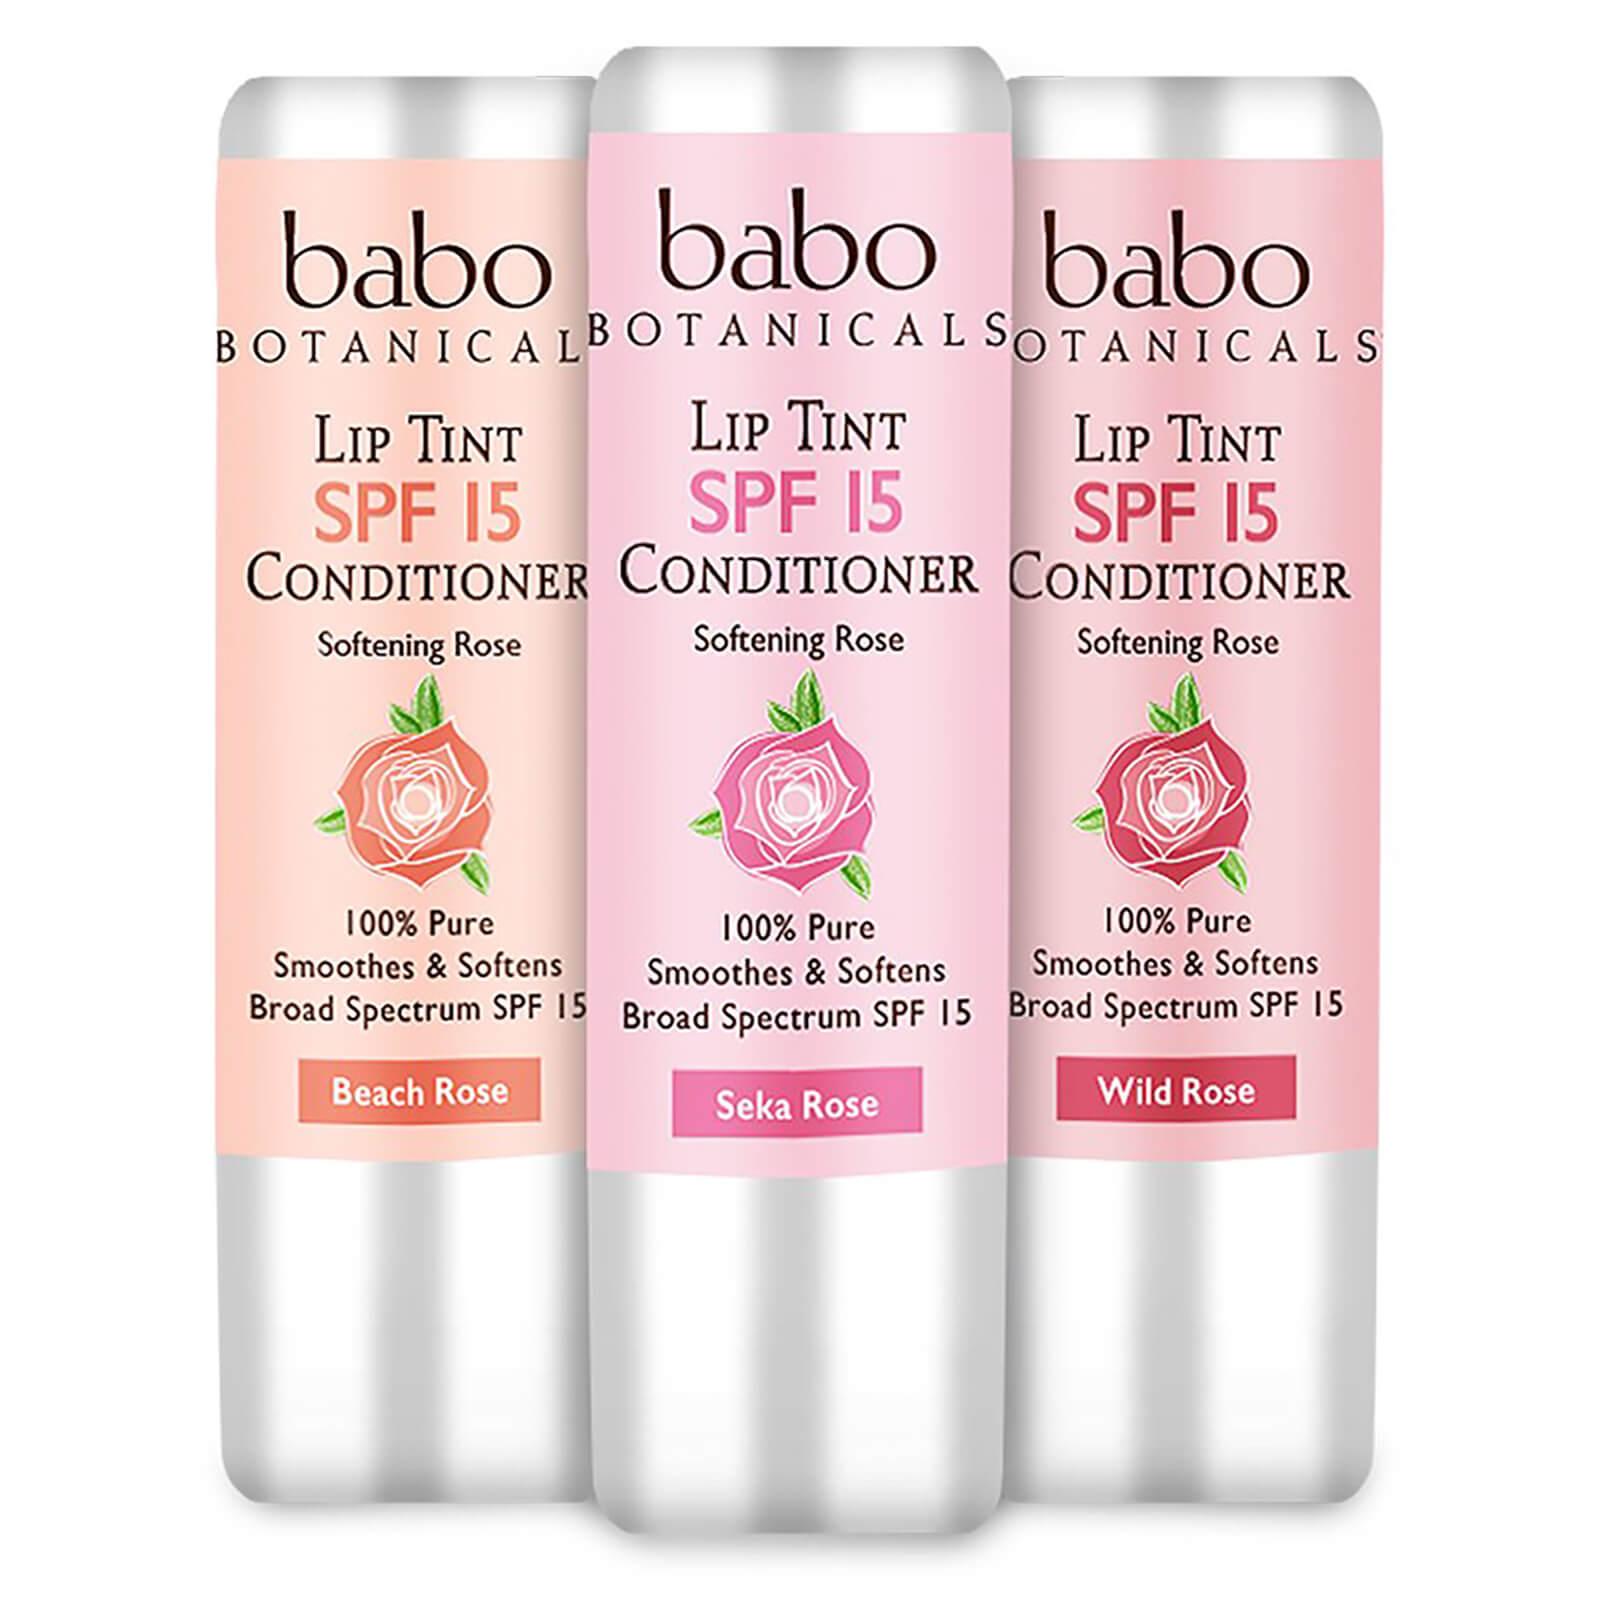 Babo Botanicals SPF15 SPRING LIP TINT TRIO GIFT SET (WORTH $29.85)